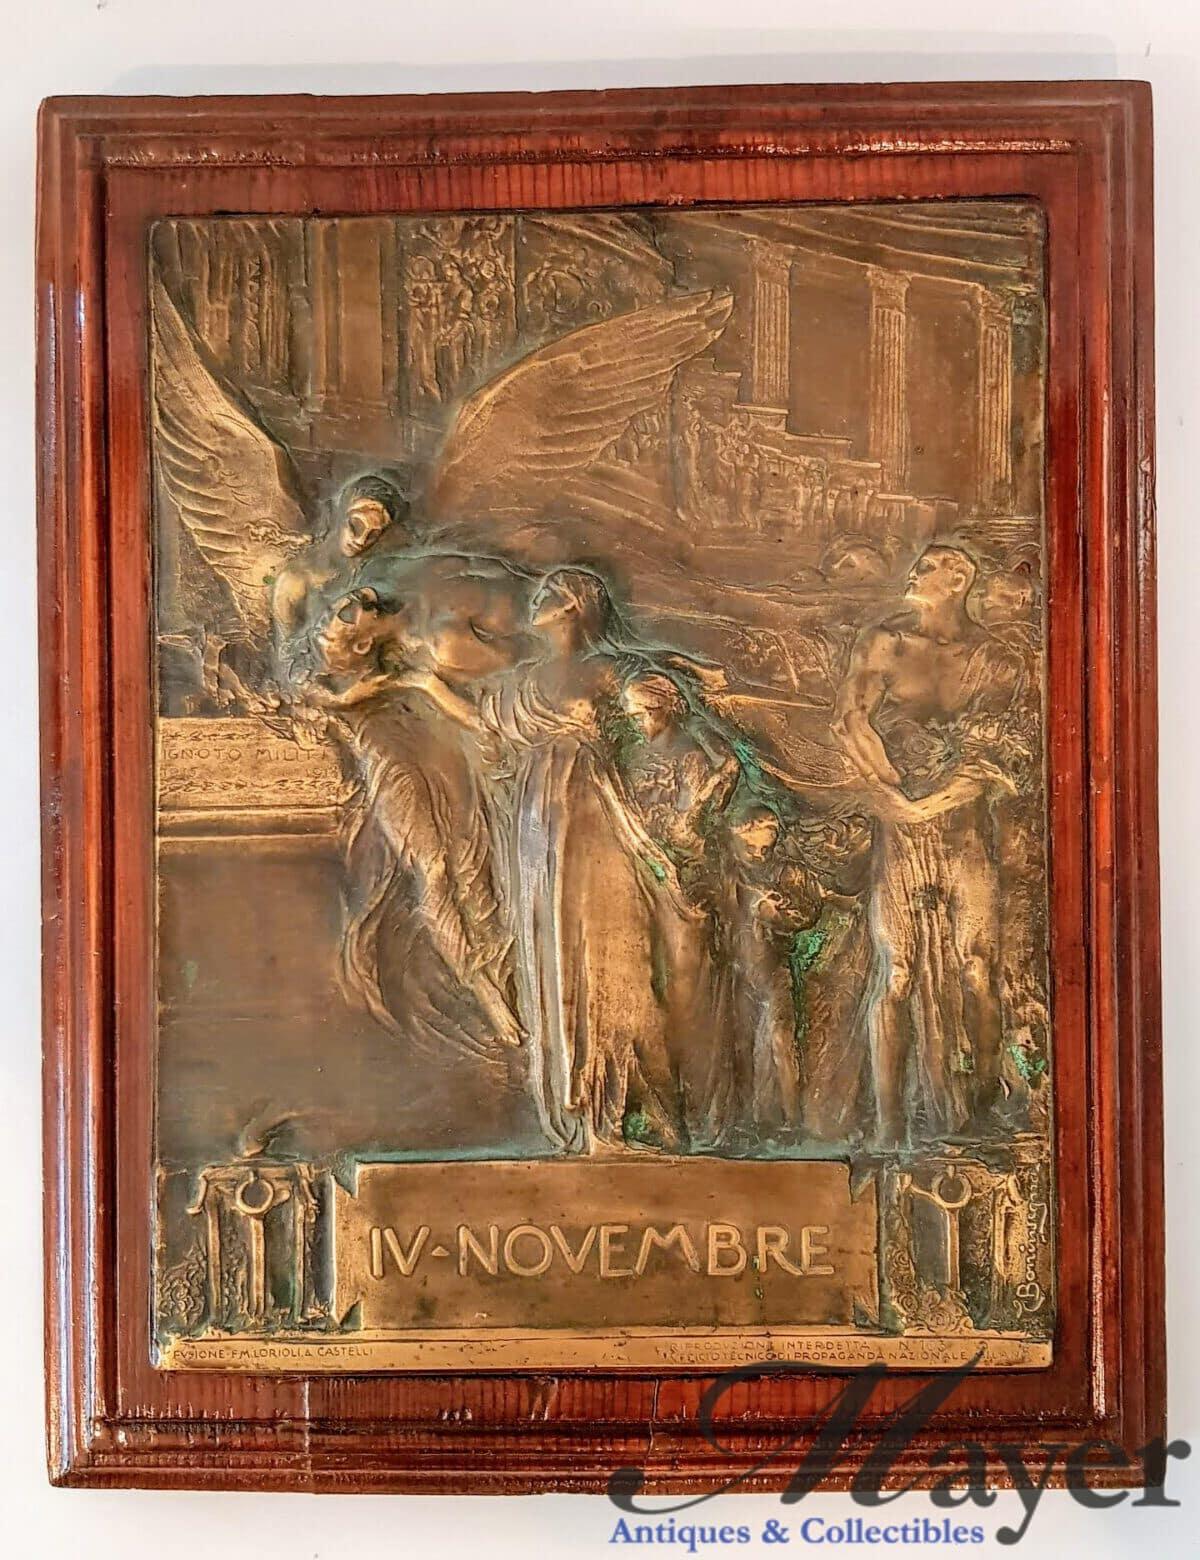 November 4th WW1 Memorial Plaque By Egidio Boninsegna